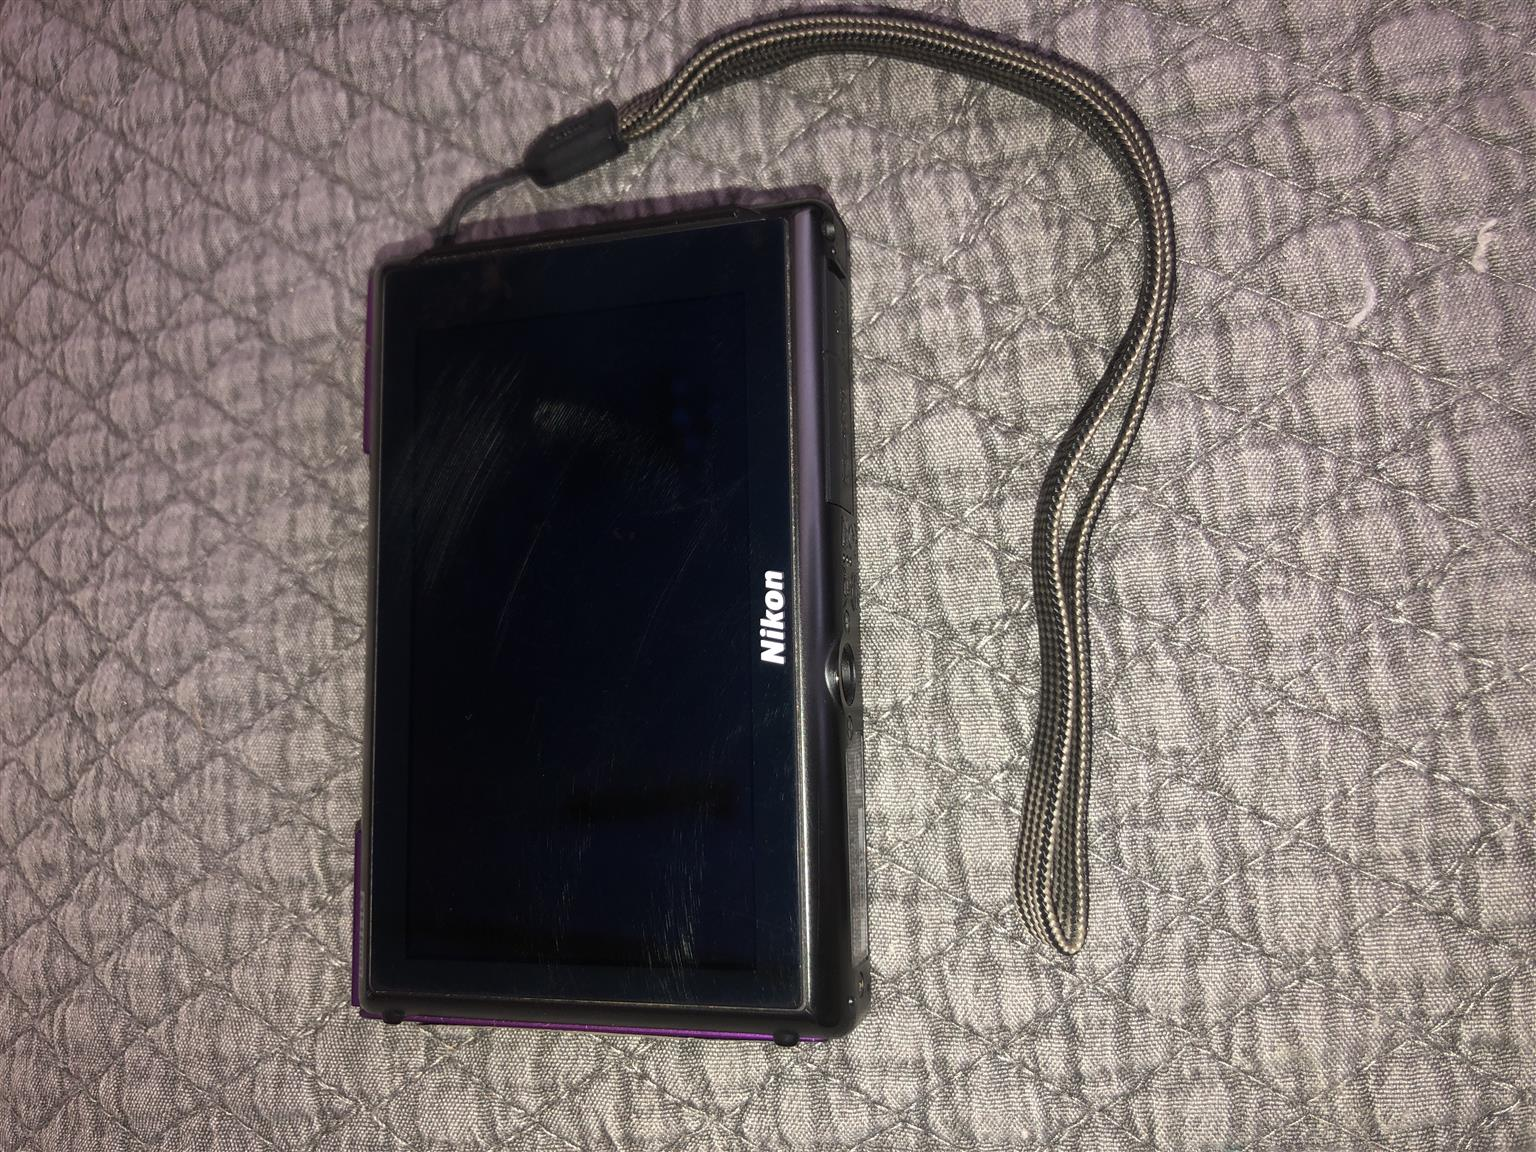 Nikon CoolPix S100 Digital Camera (Purple)  (Price: Negotiable)